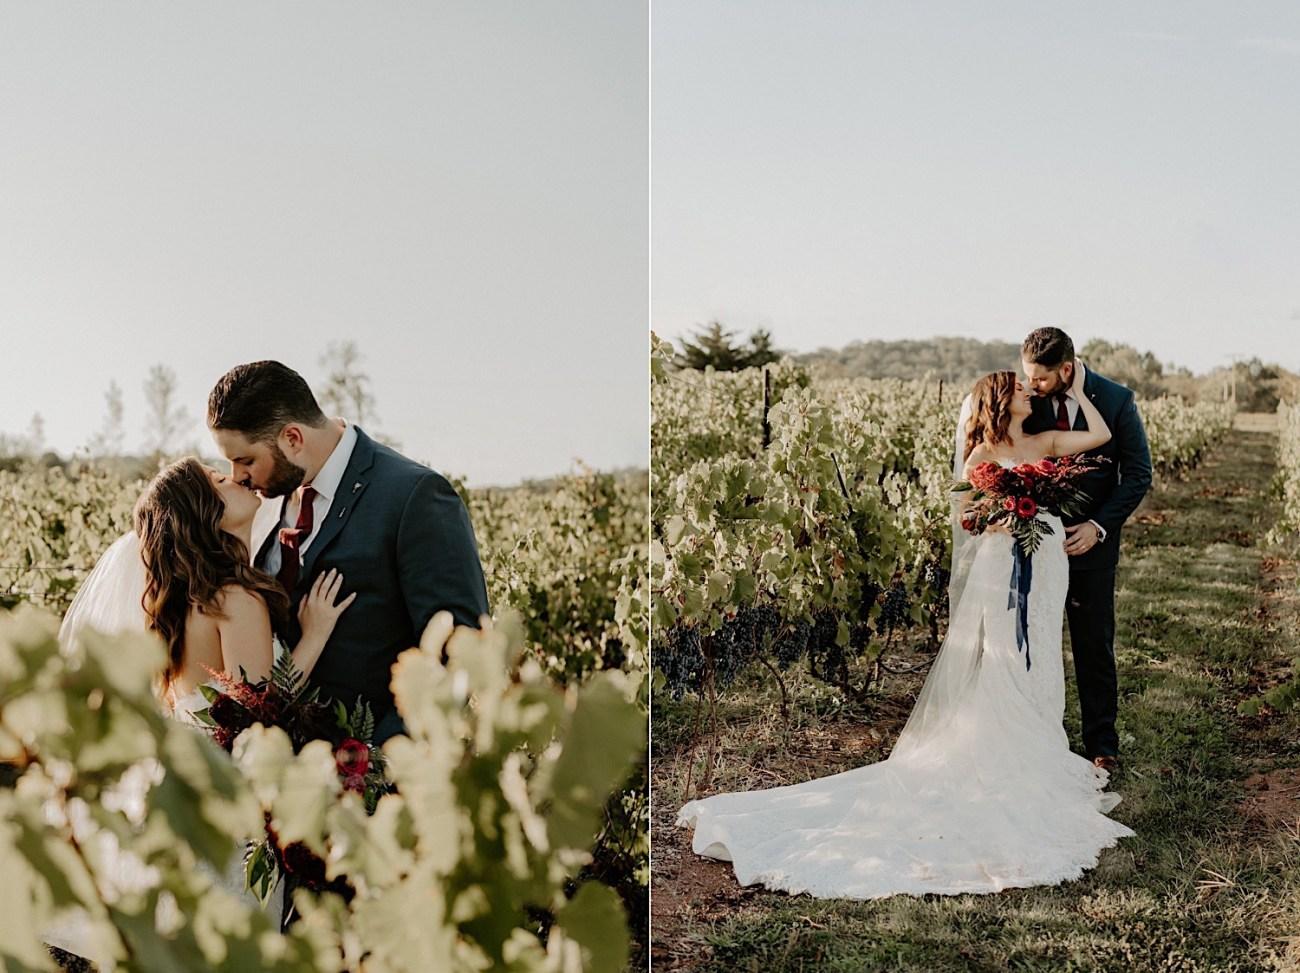 Hopewell Valley Vineyards Wedding New Jersey Wedding Photographer 17